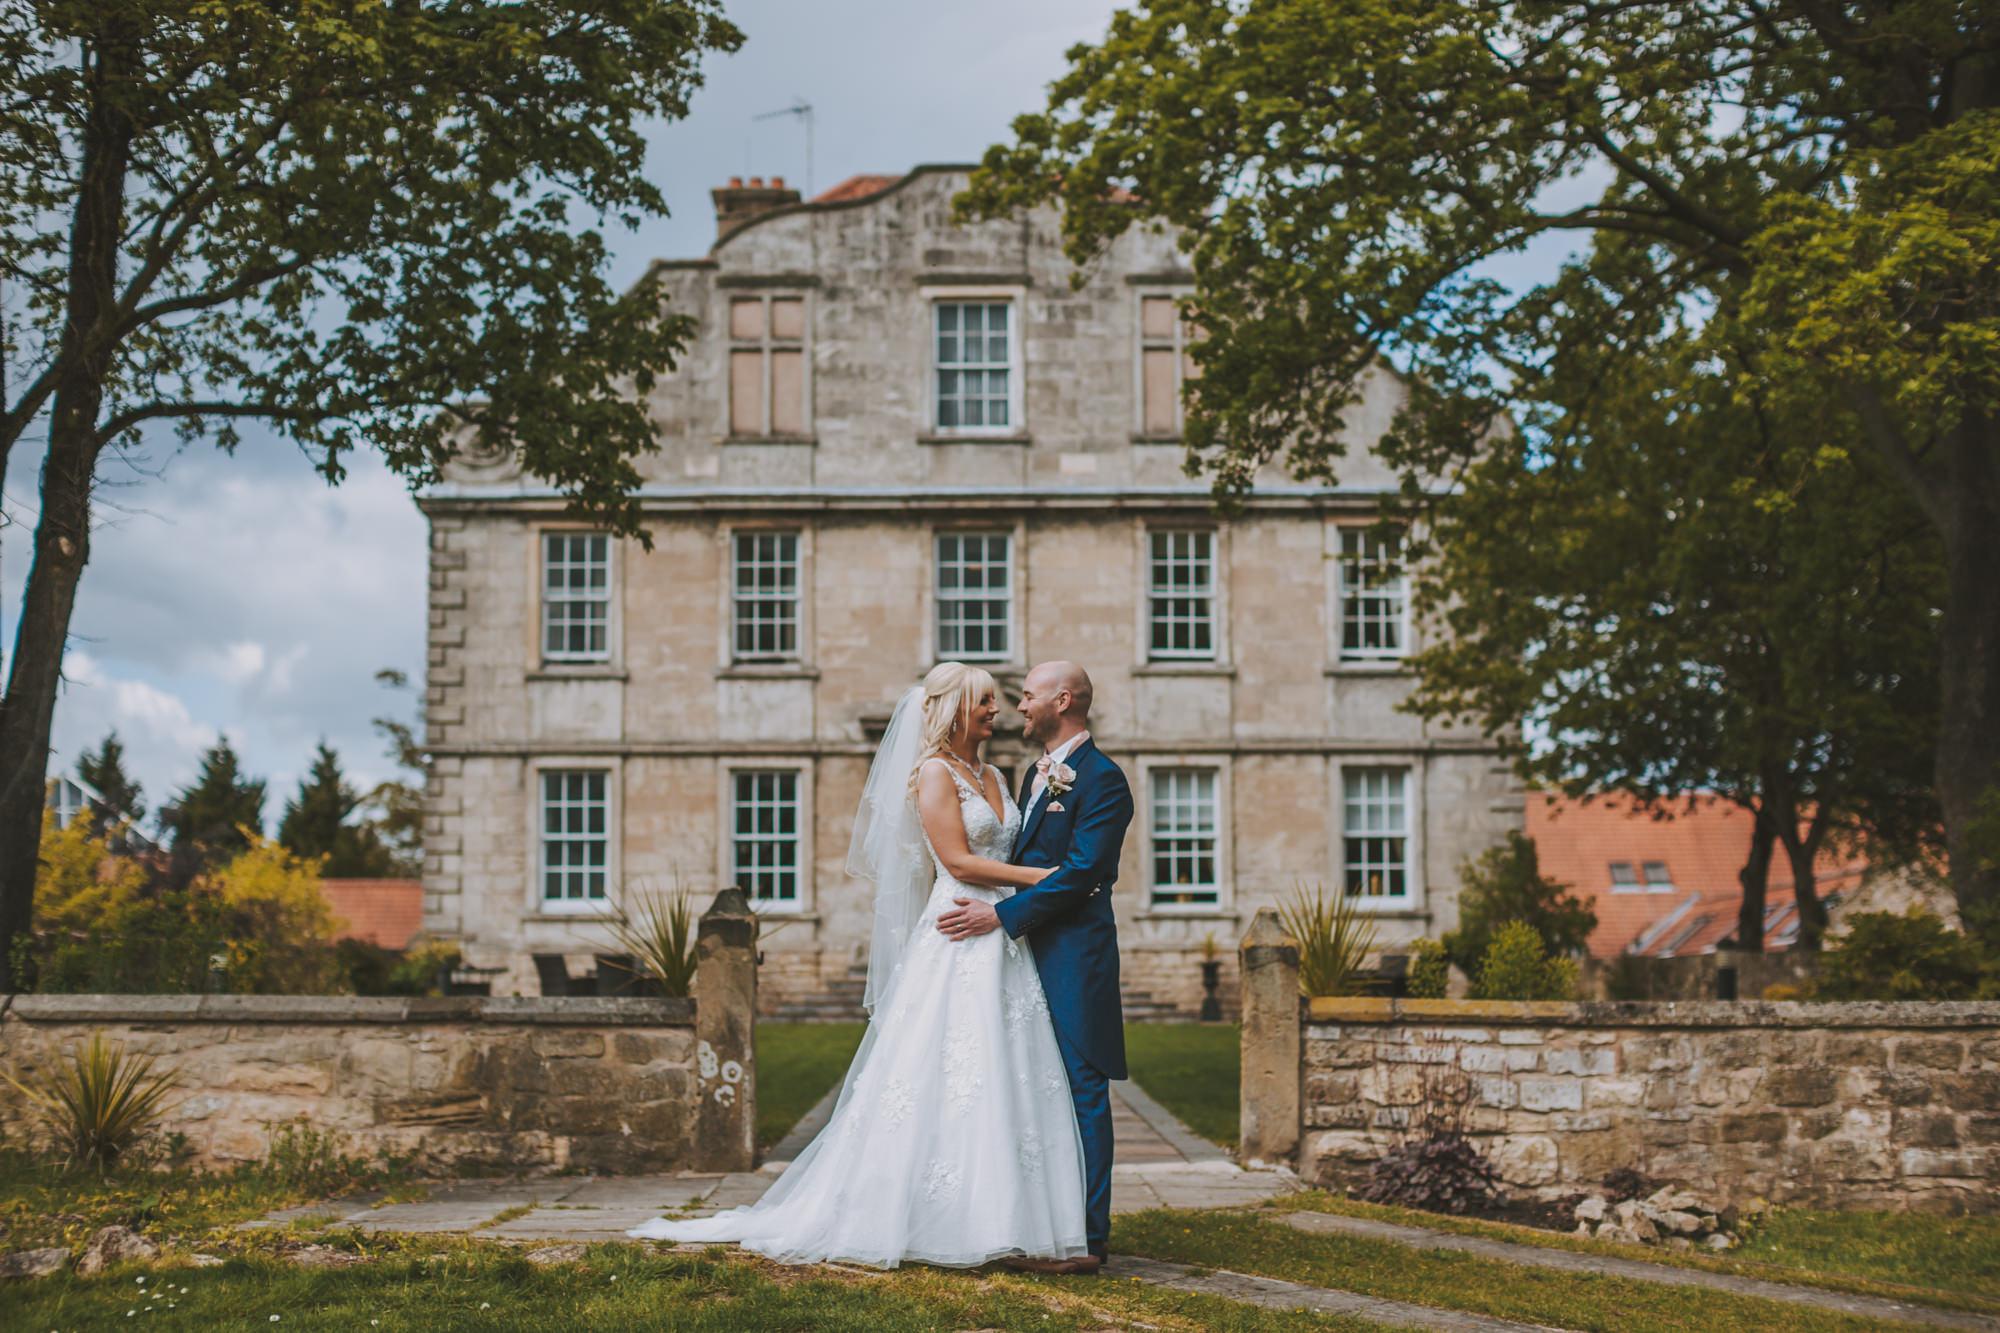 hellaby hall wedding photographers in rotherham, yorkshire-55.jpg